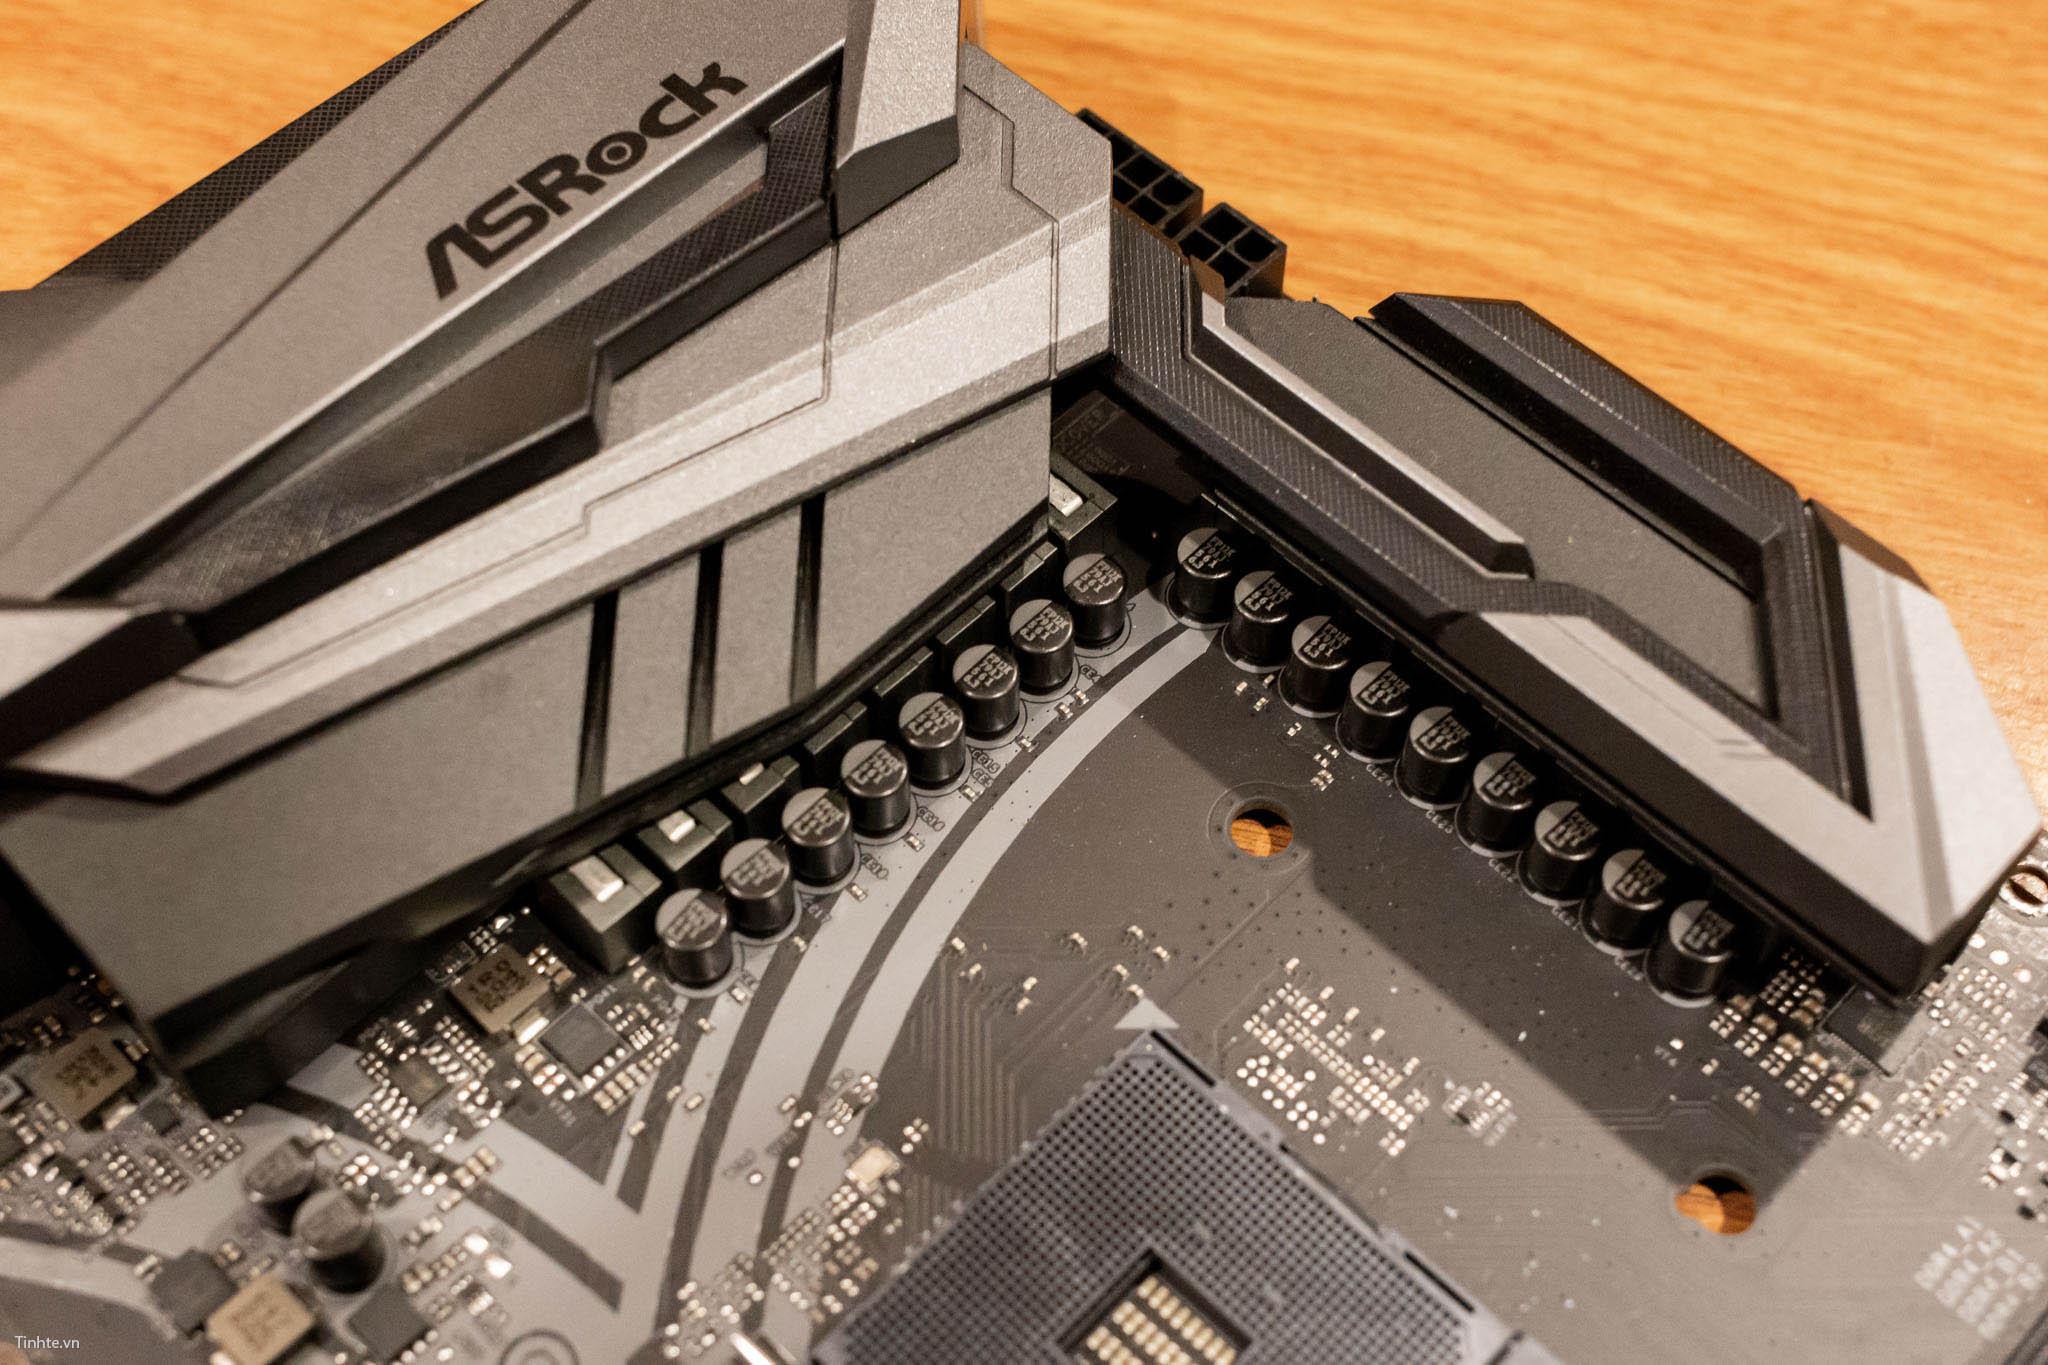 Tinhte.vn_AMD_Ryzen_7_2700-9.jpg